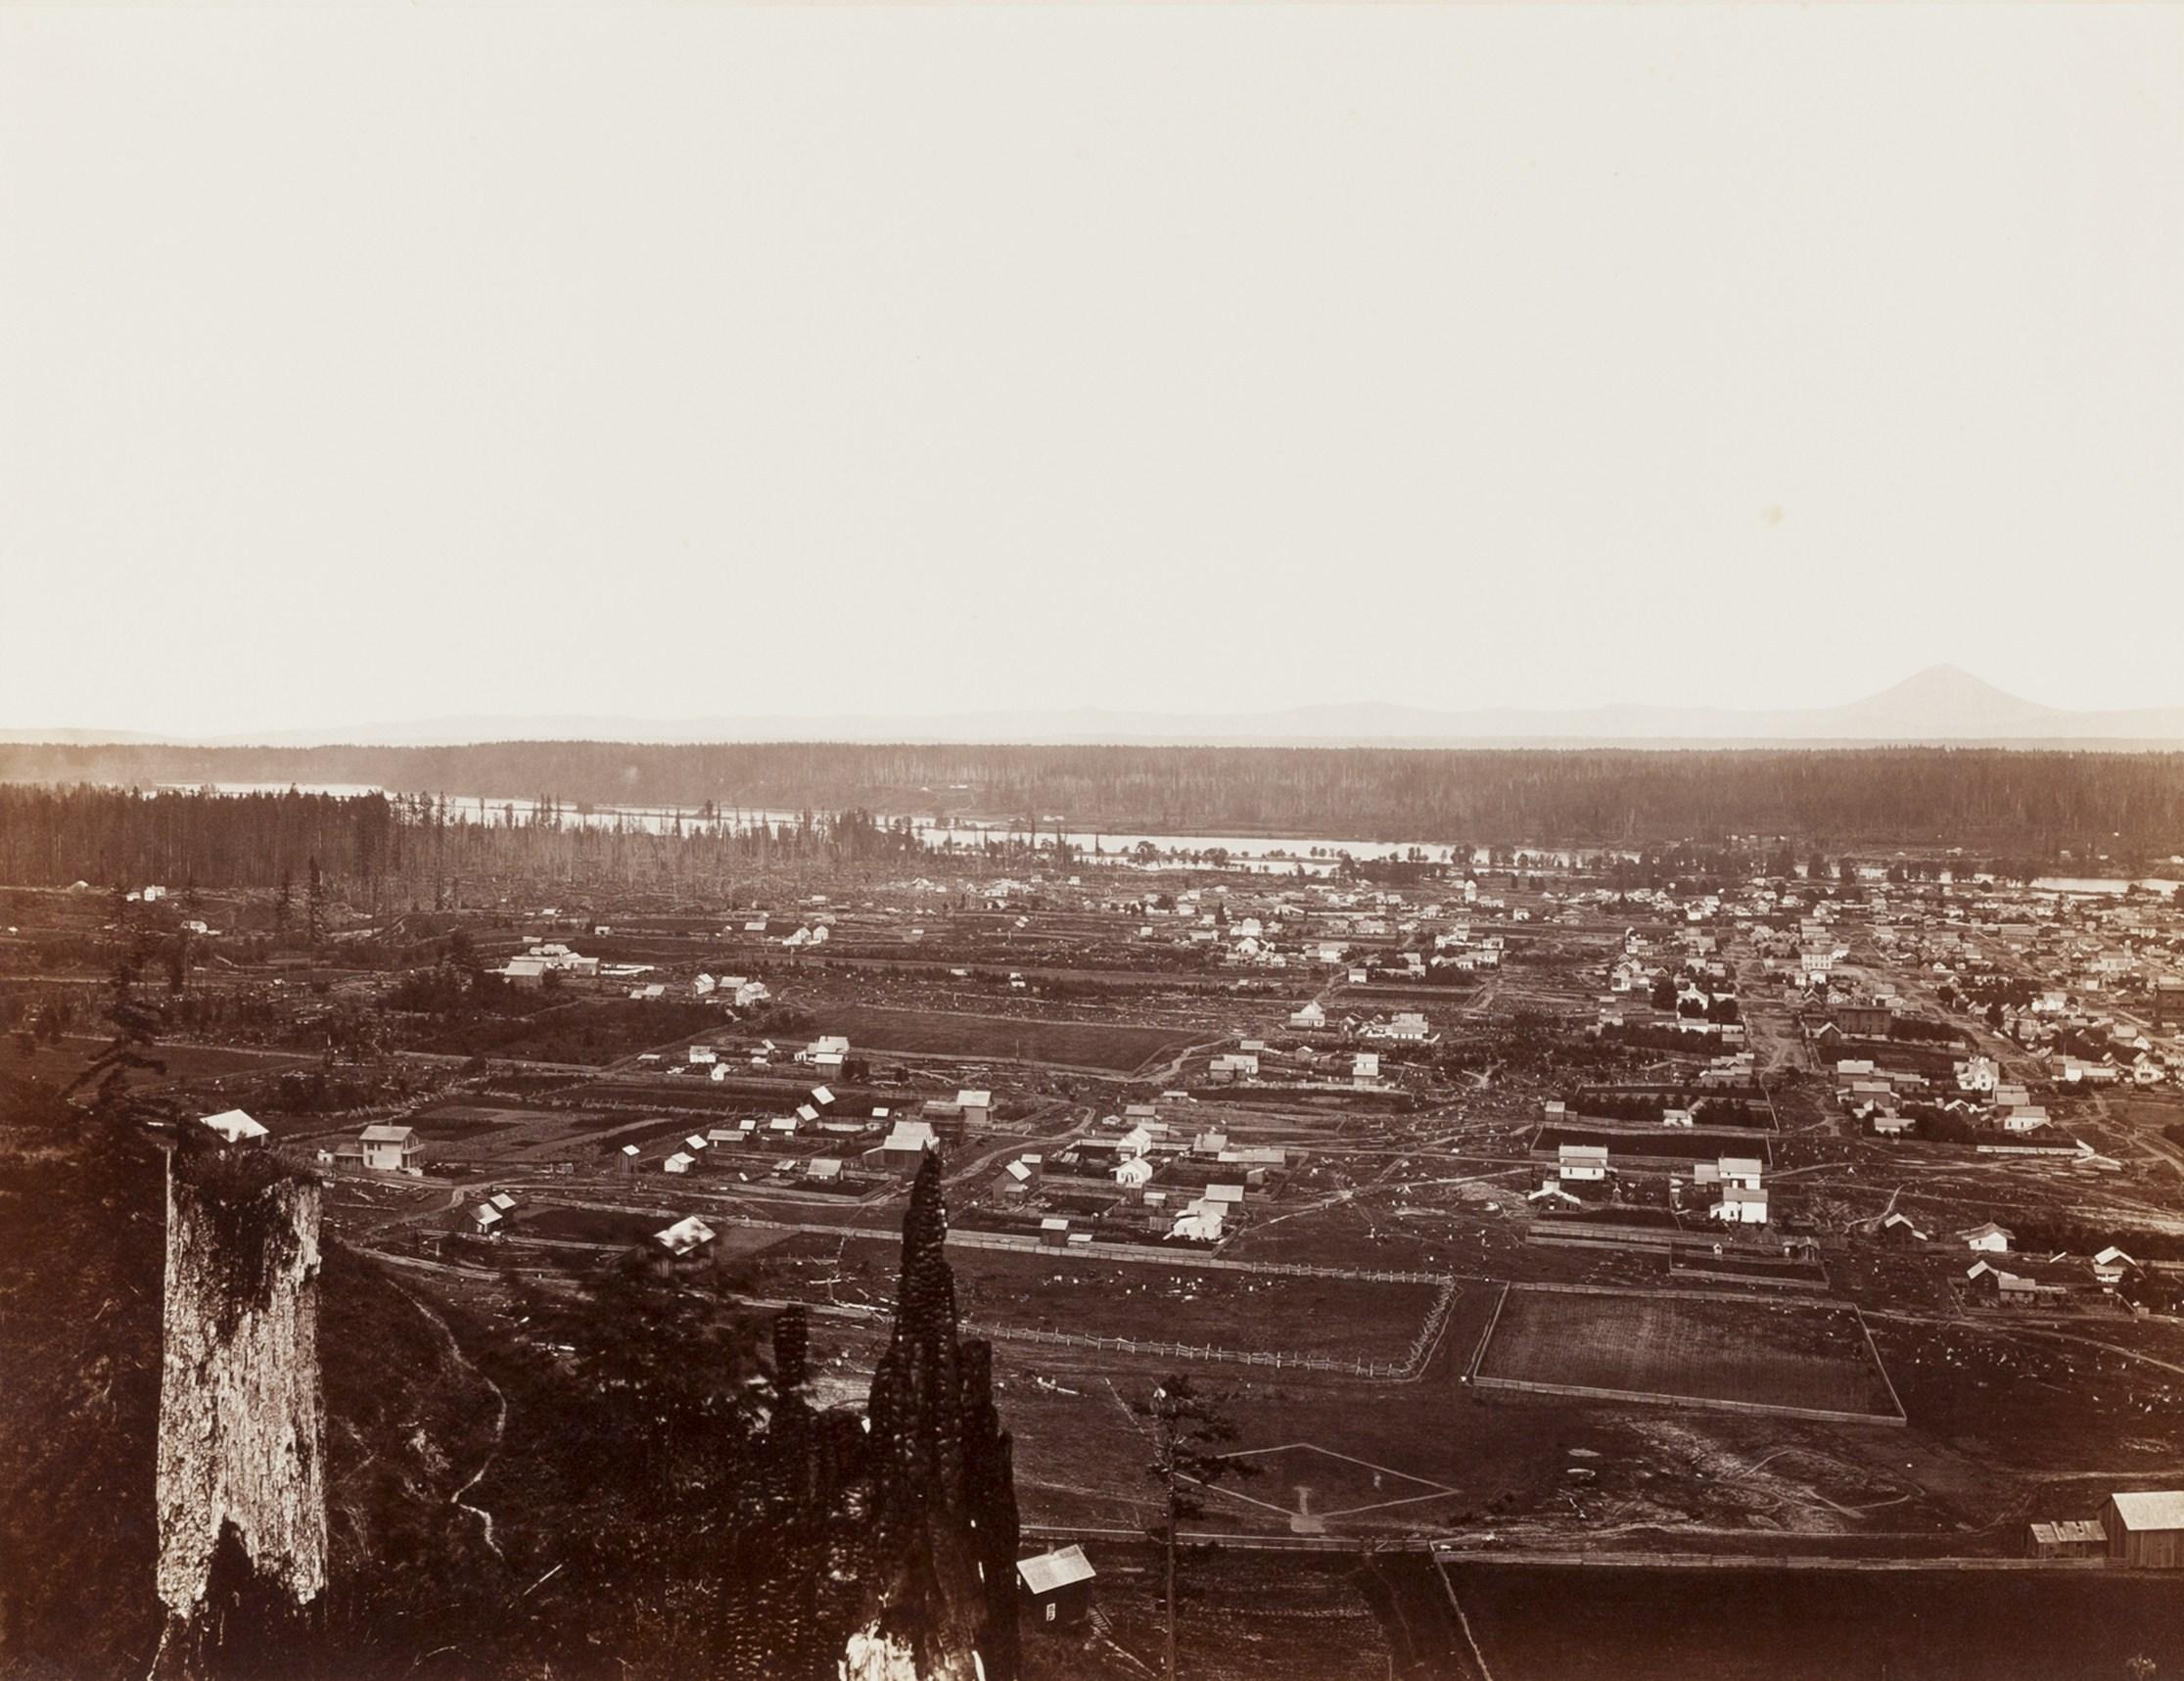 Carleton E. Watkins, City of Portland, Willamette River, 1867